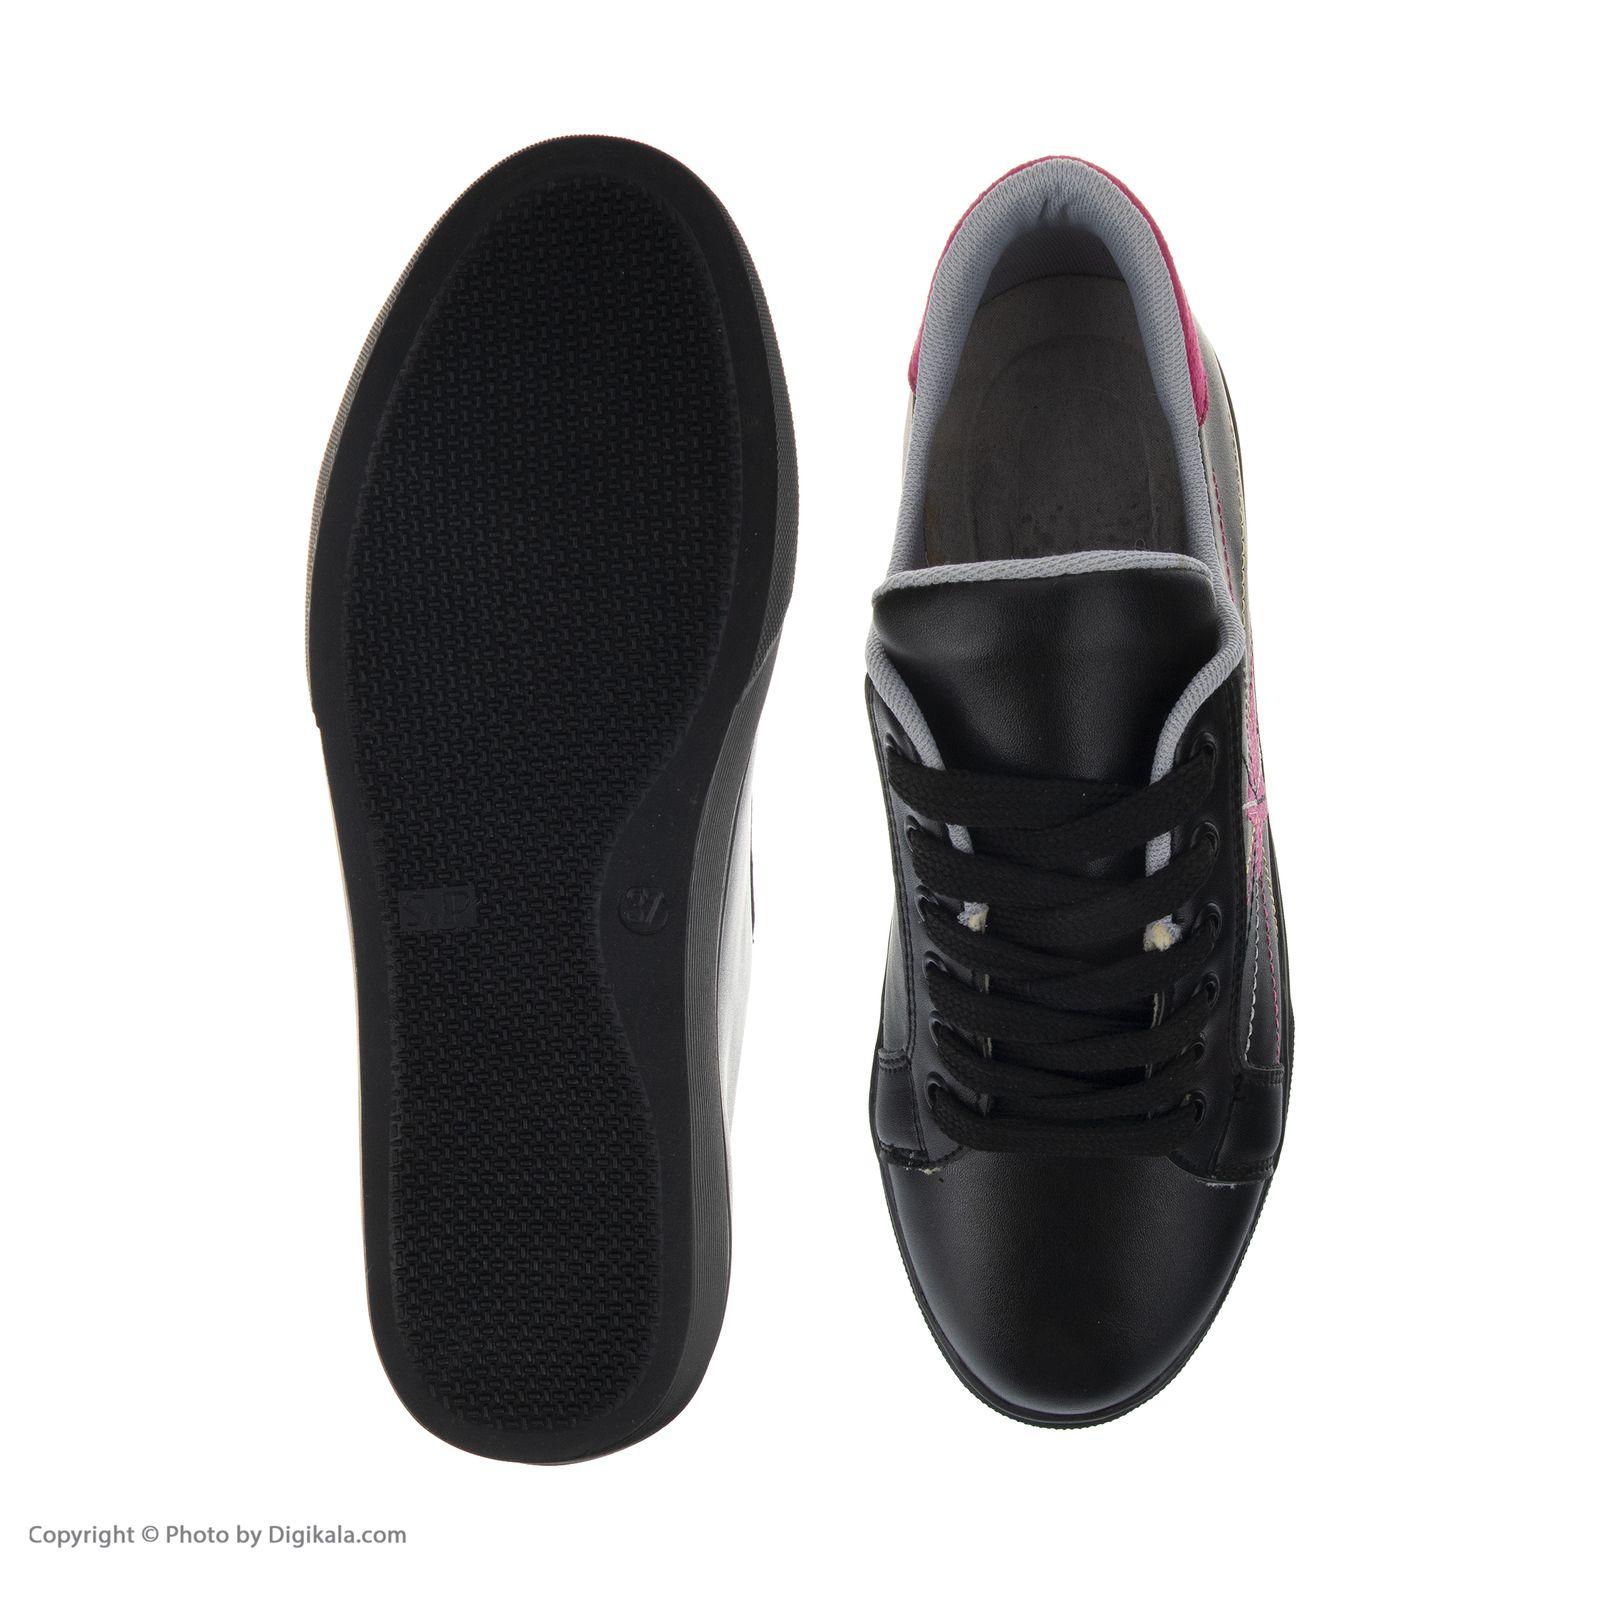 کفش روزمره زنانه مدل 4023 -  - 8